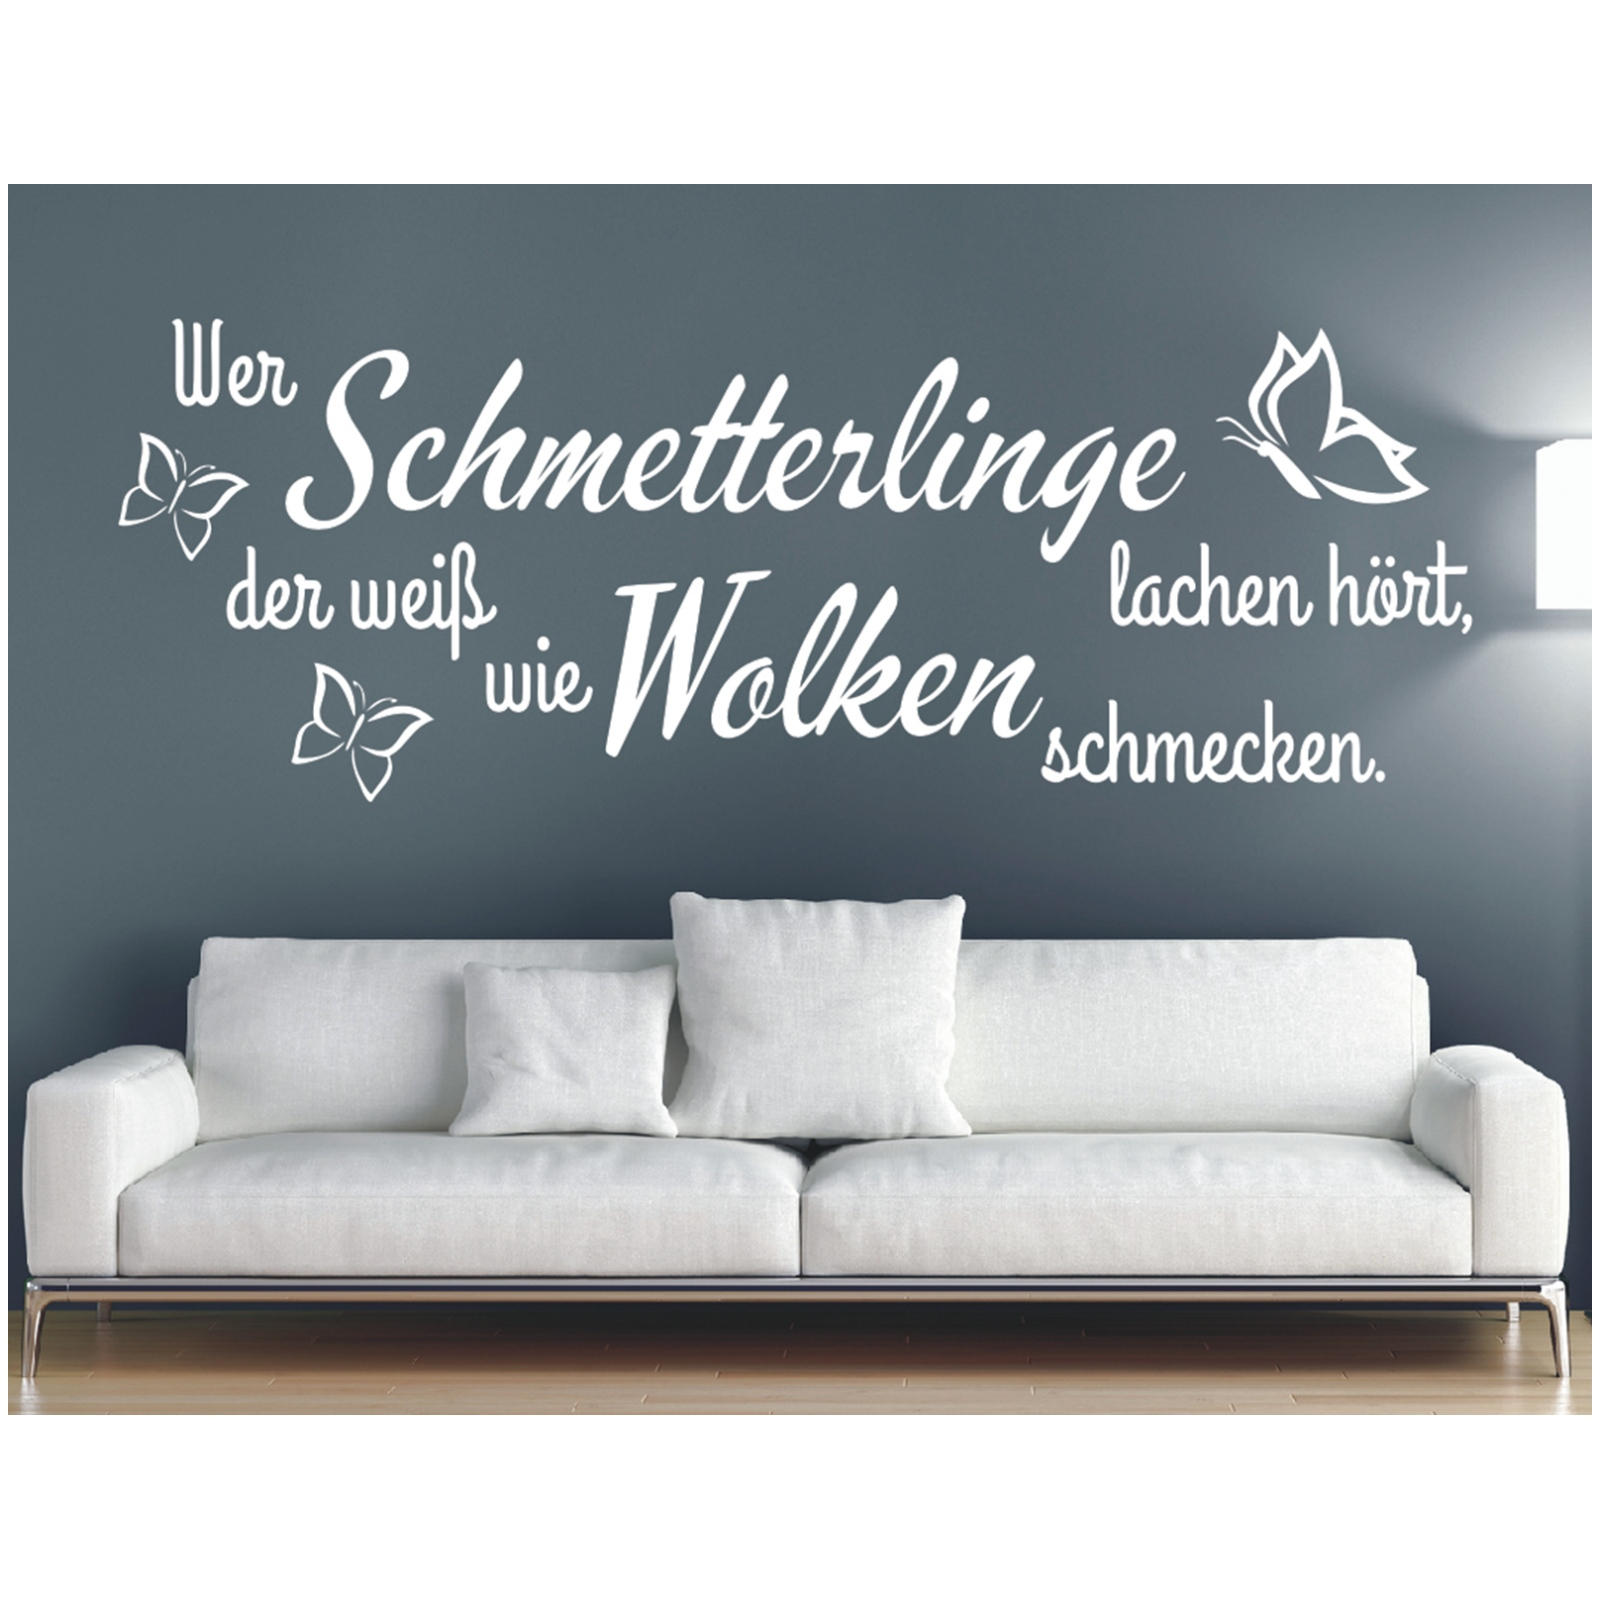 Wandtattoo Spruch Schmetterlinge Lachen Wandsticker Wandaufkleber Sticker 2 Eur 12 90 Picclick De